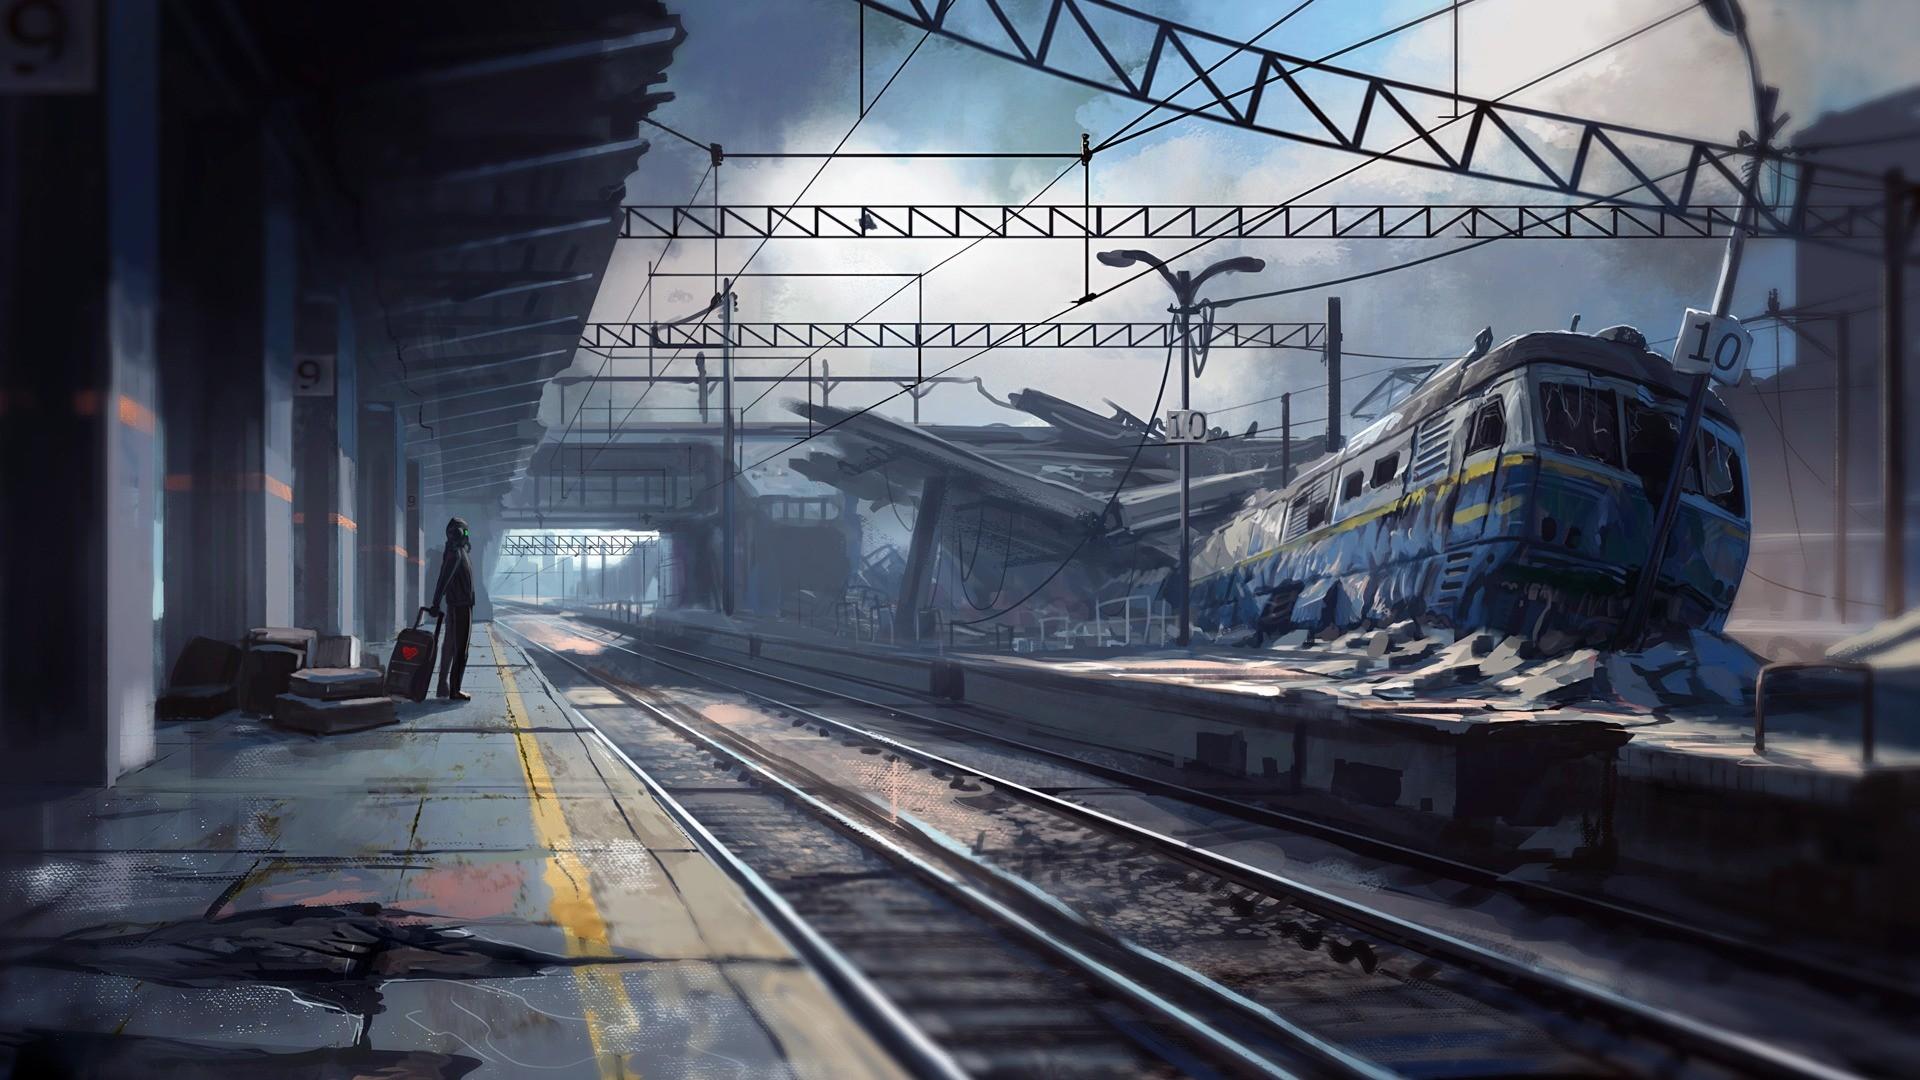 artwork, fantasy art, apocalyptic, train, train station - wallpaper ...